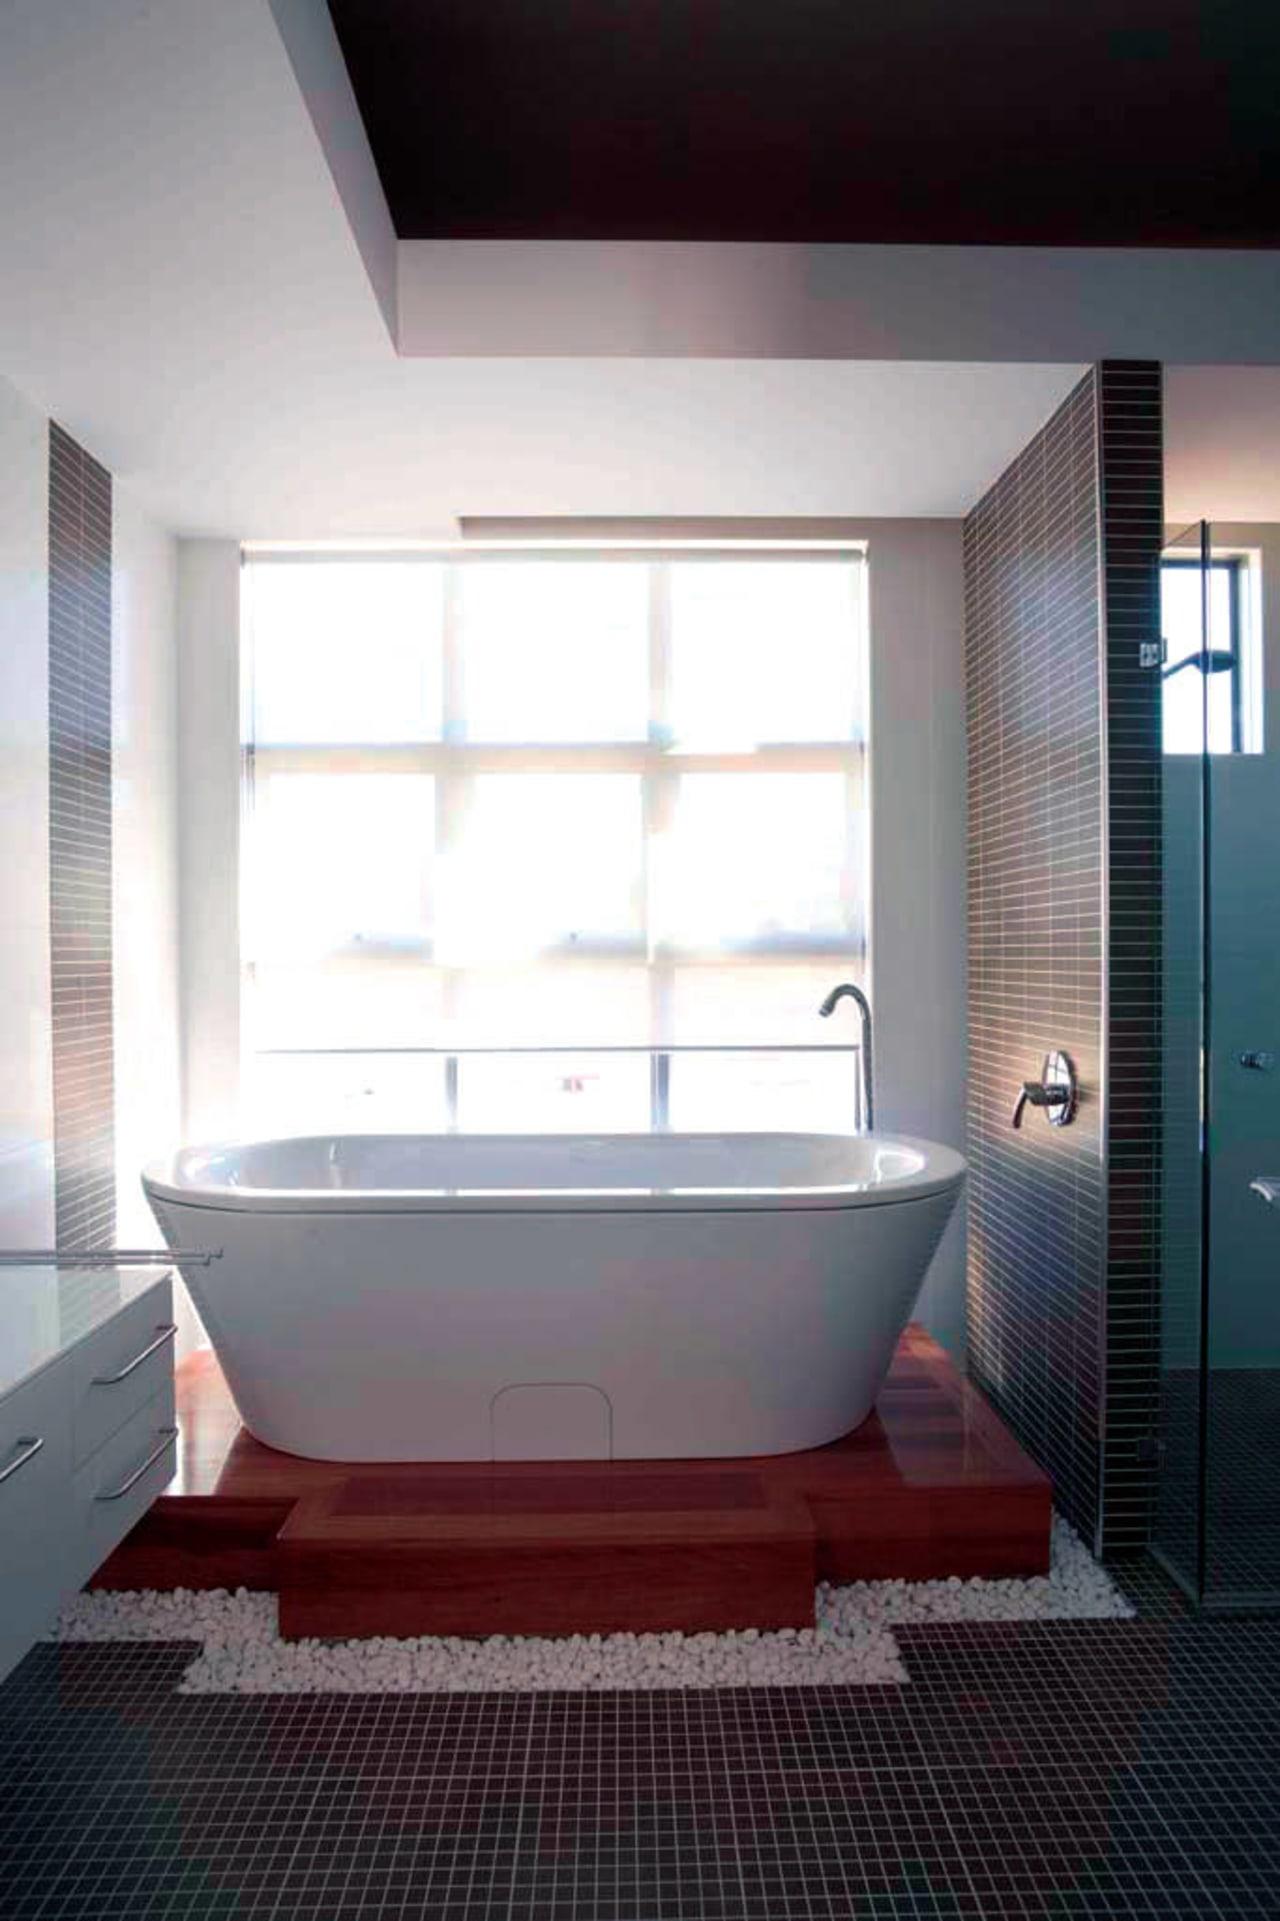 View of the bathroom of a high-end custom architecture, bathroom, bathtub, ceiling, daylighting, floor, interior design, plumbing fixture, room, window, white, gray, black